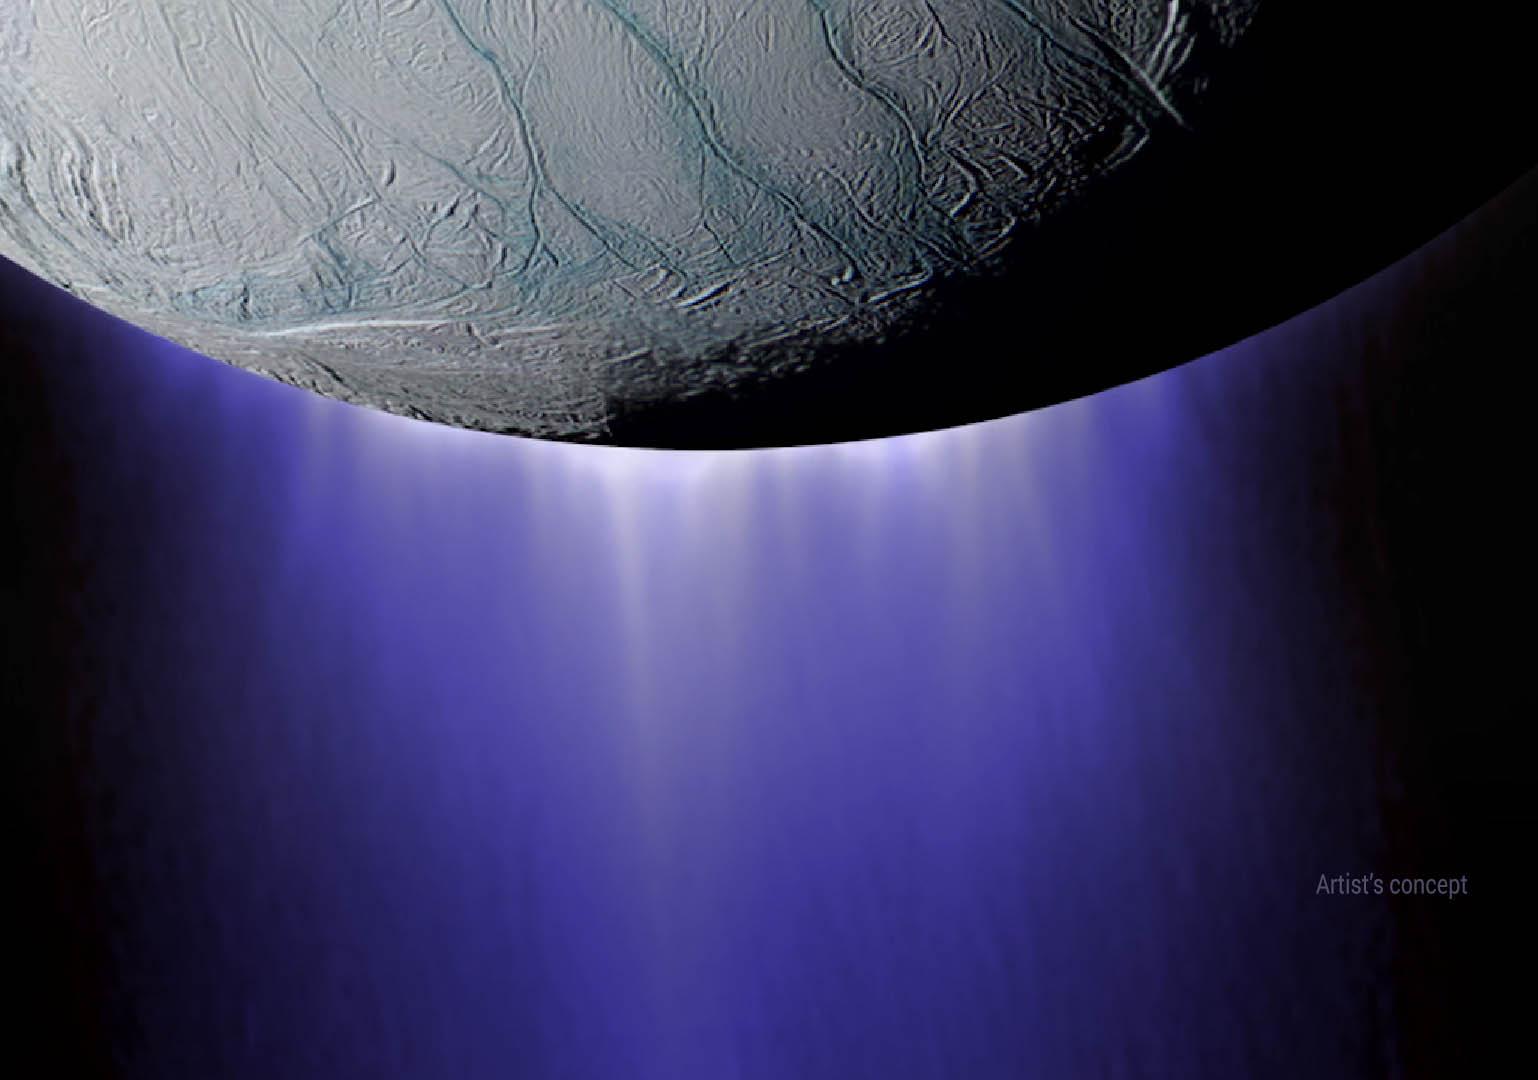 Encelado potrebbe ospitare forme di vita